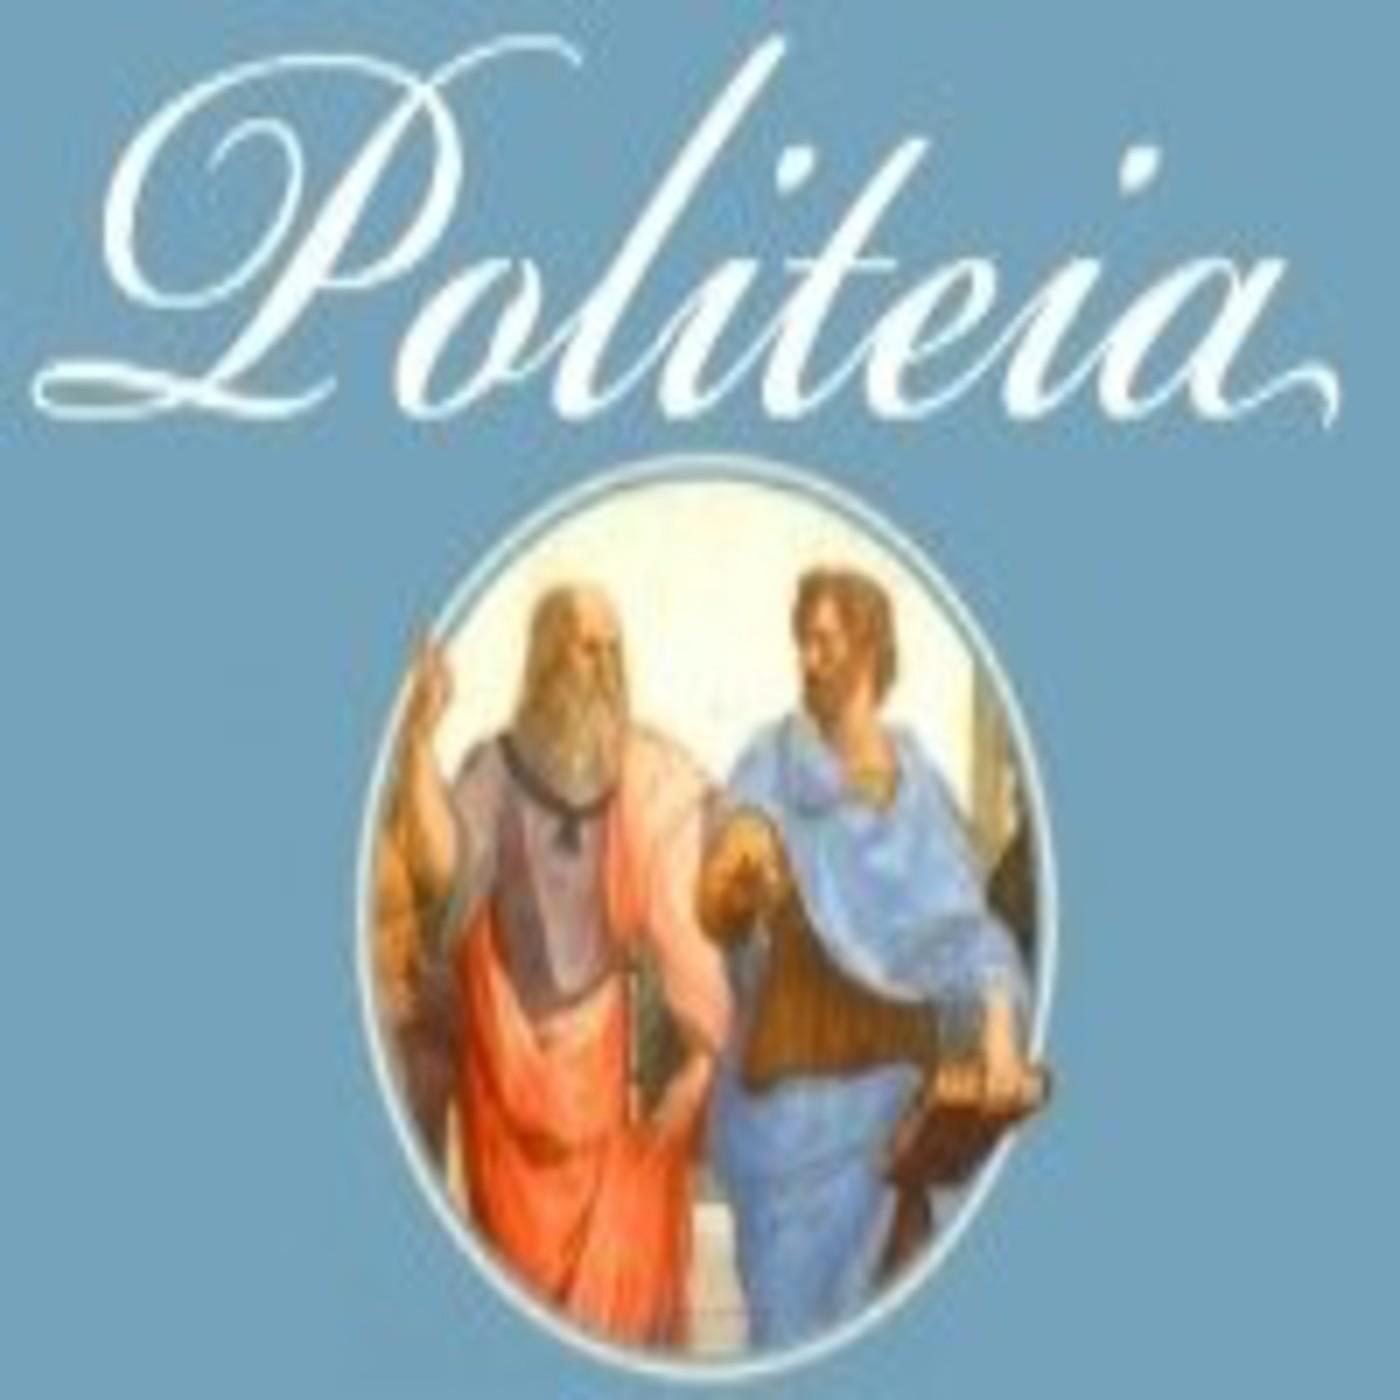 Entrevista a Julio Anguita 18-07-2012 POLITEIA